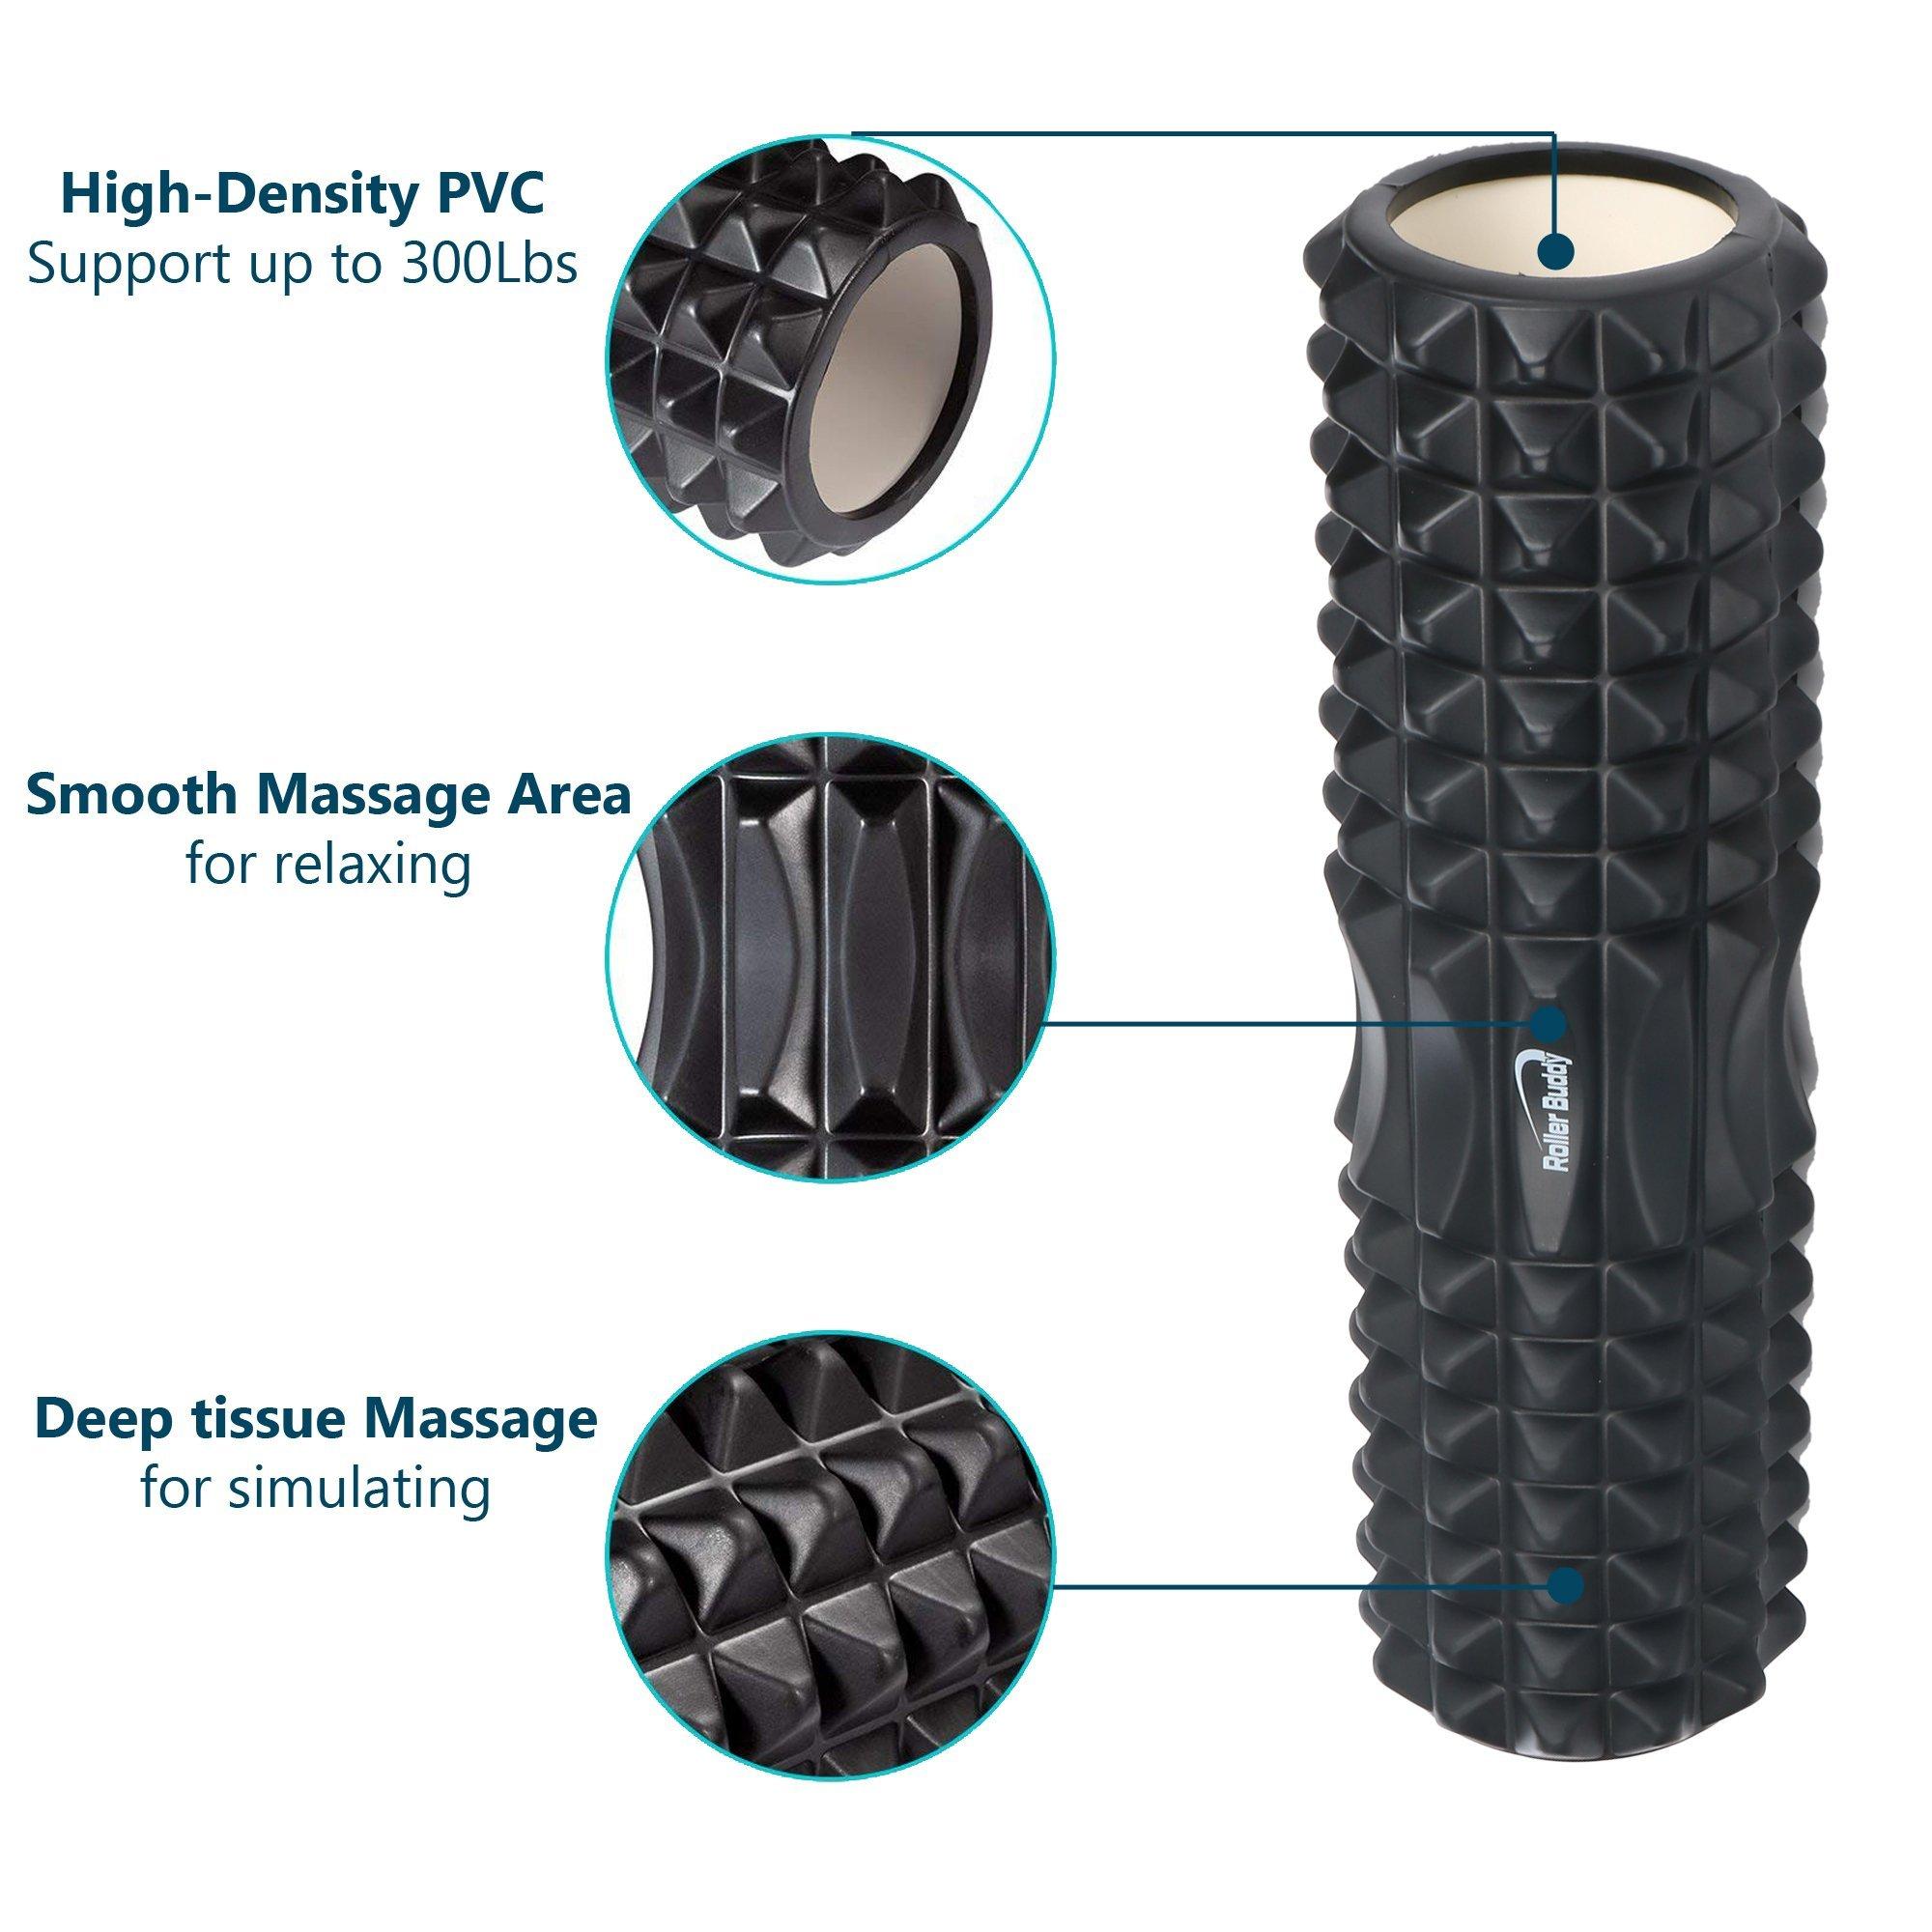 Muscle Massage Foam Roller Kit Back Massager Roller - 4 in 1 Best Trigger Point Massage Tool Lacrosse Roller Ball Massager Stick by Roller Buddy (Image #3)